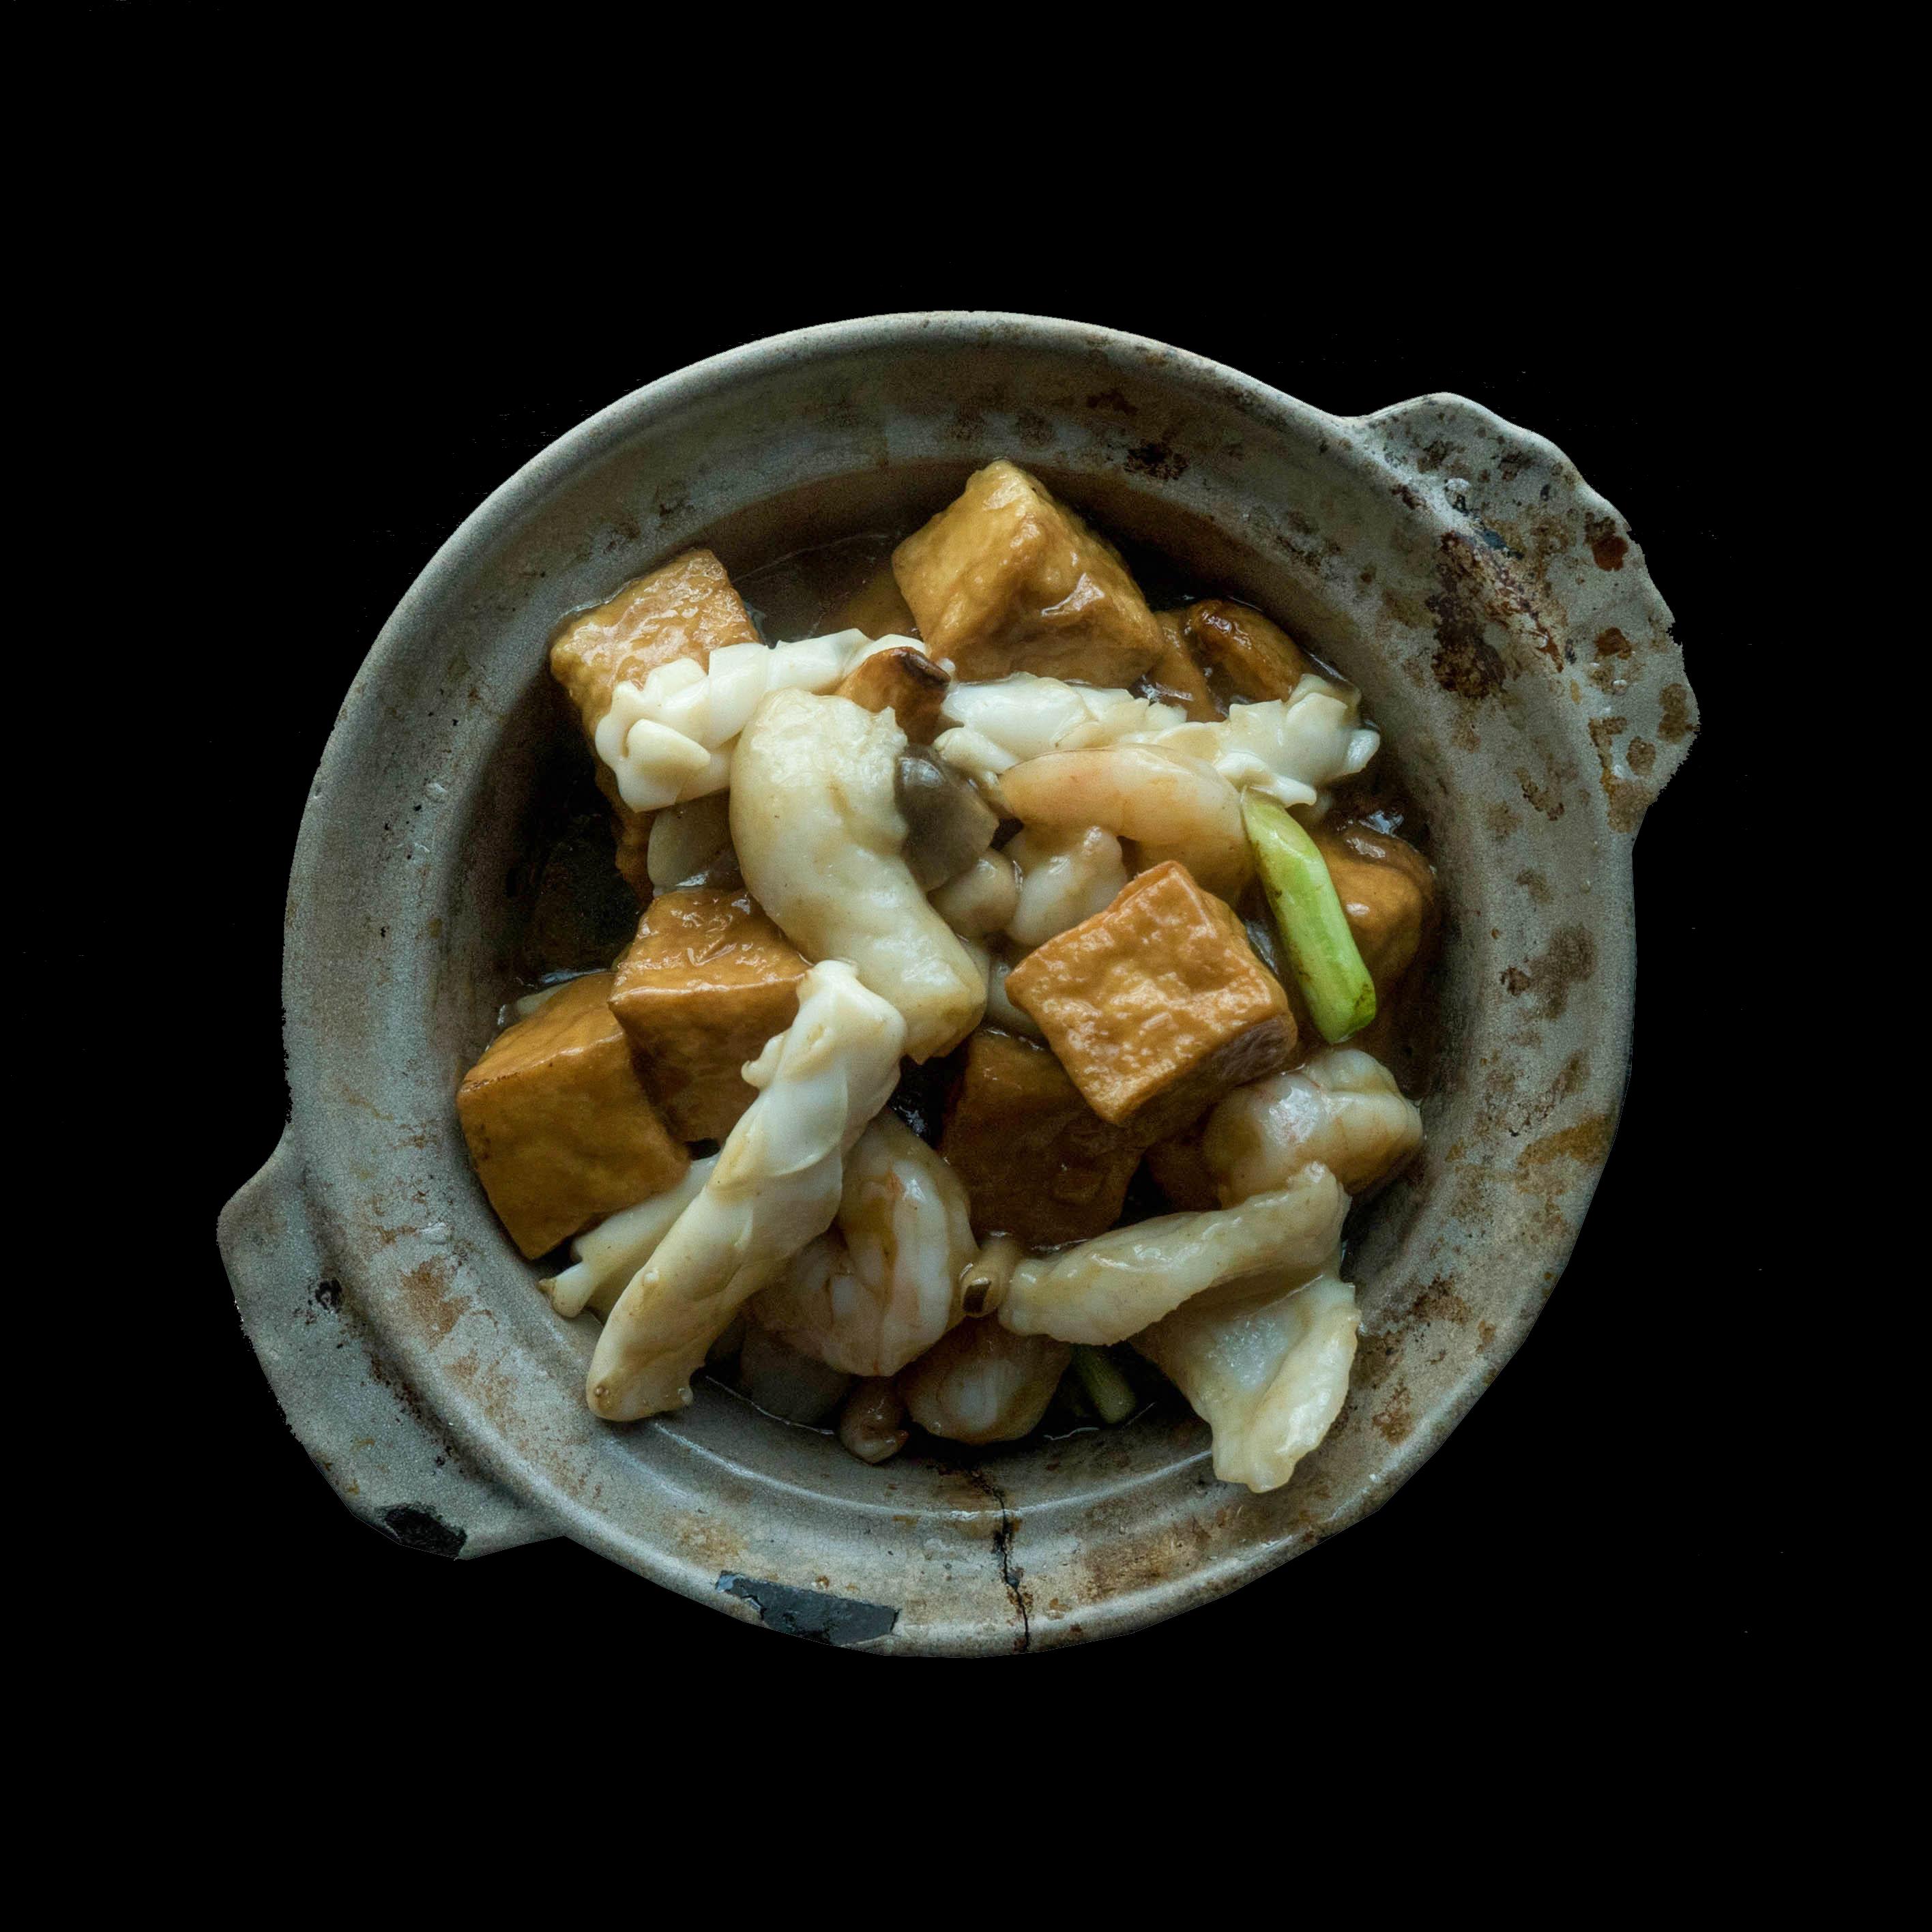 99. 海鲜豆腐煲 Seafood Braised Tofu